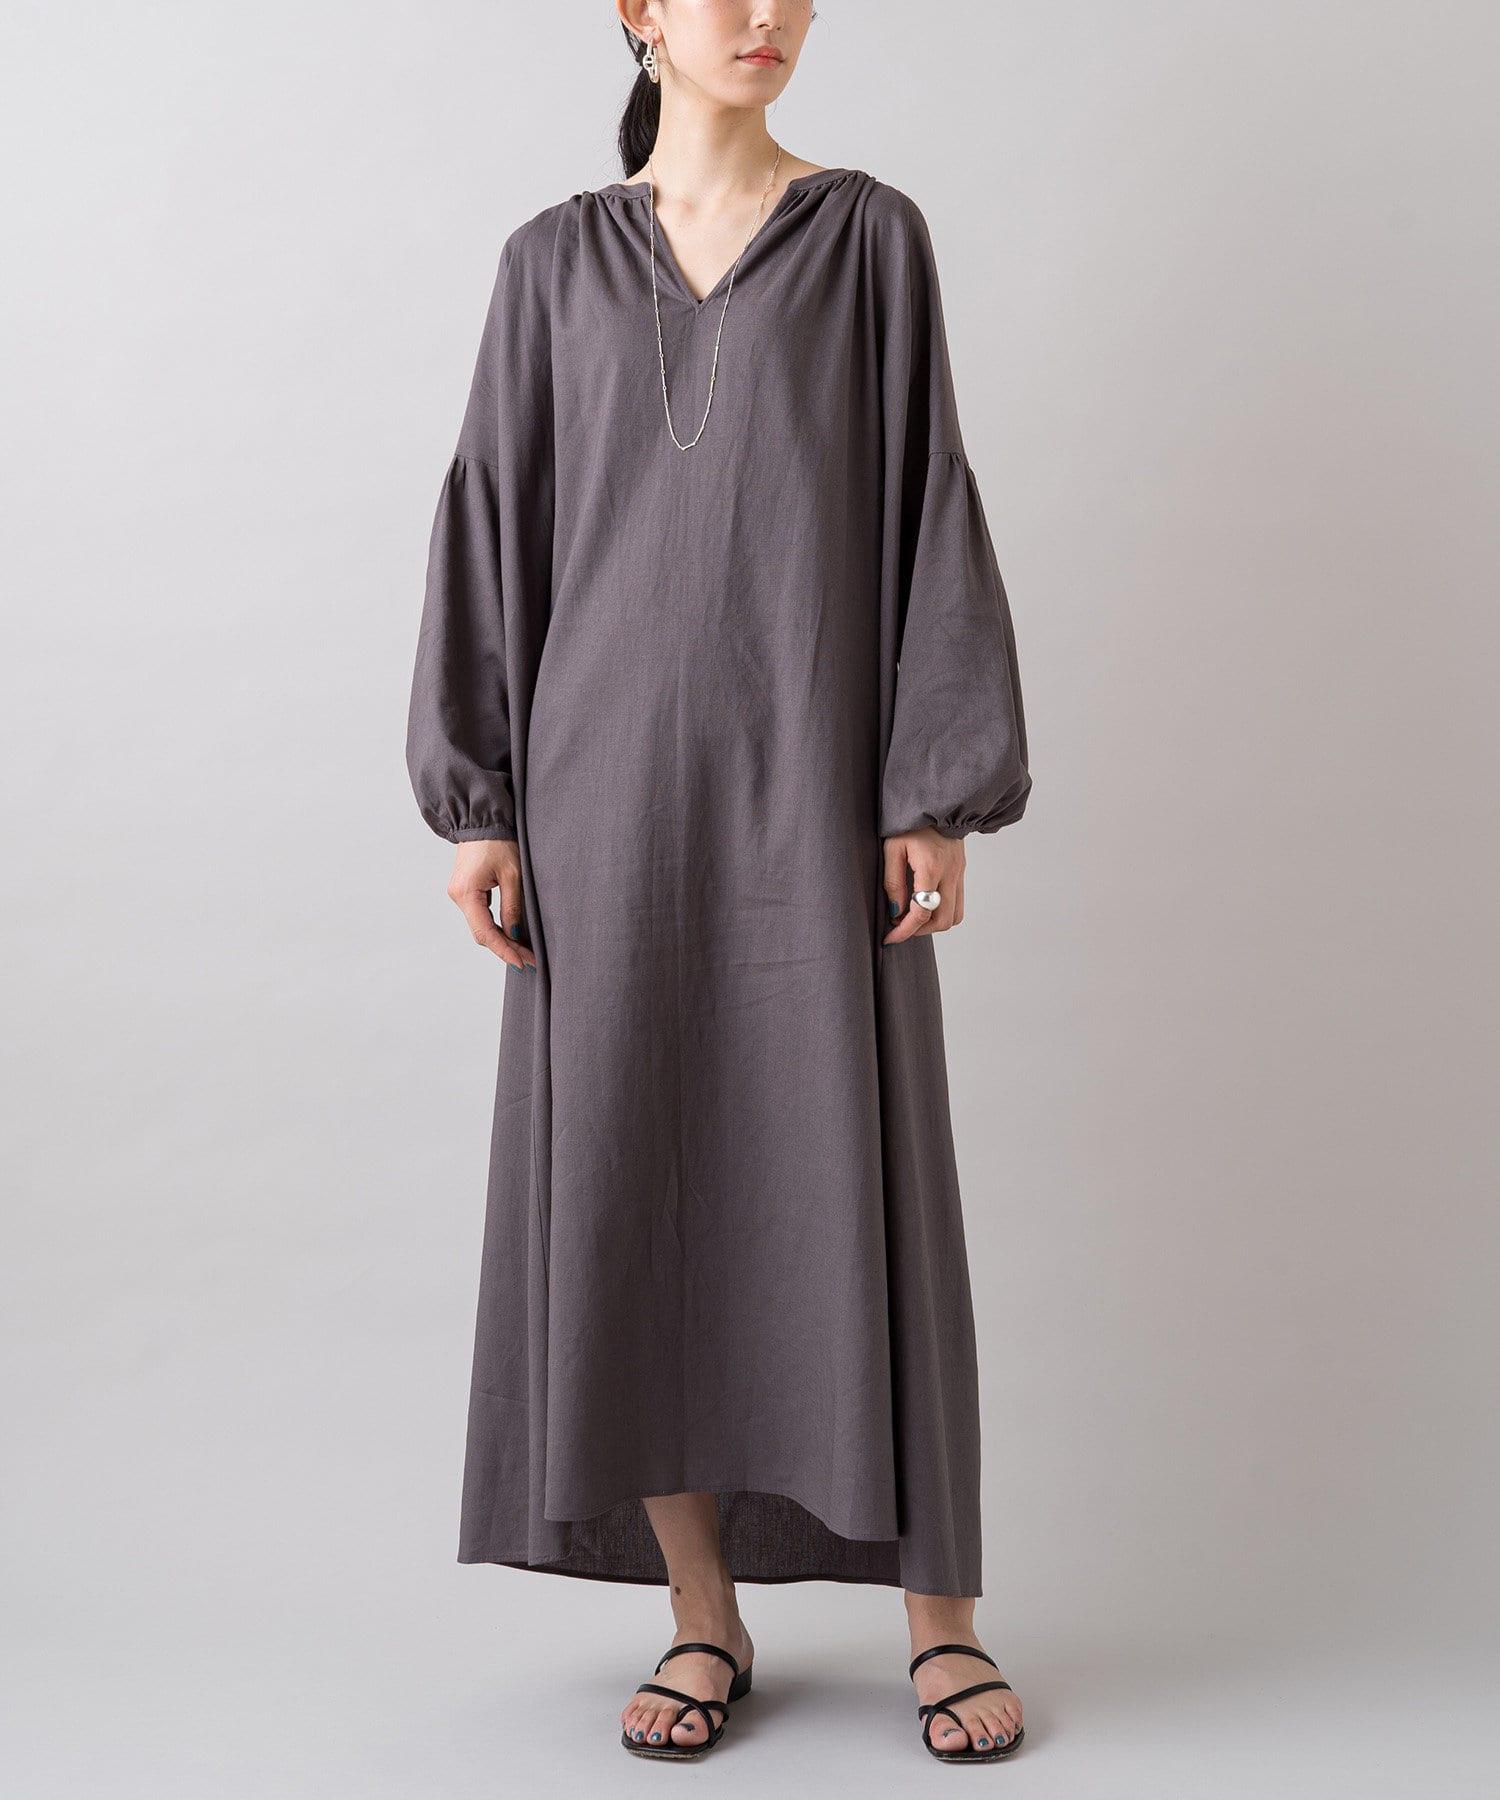 Loungedress(ラウンジドレス) 綿麻スキッパーワンピース